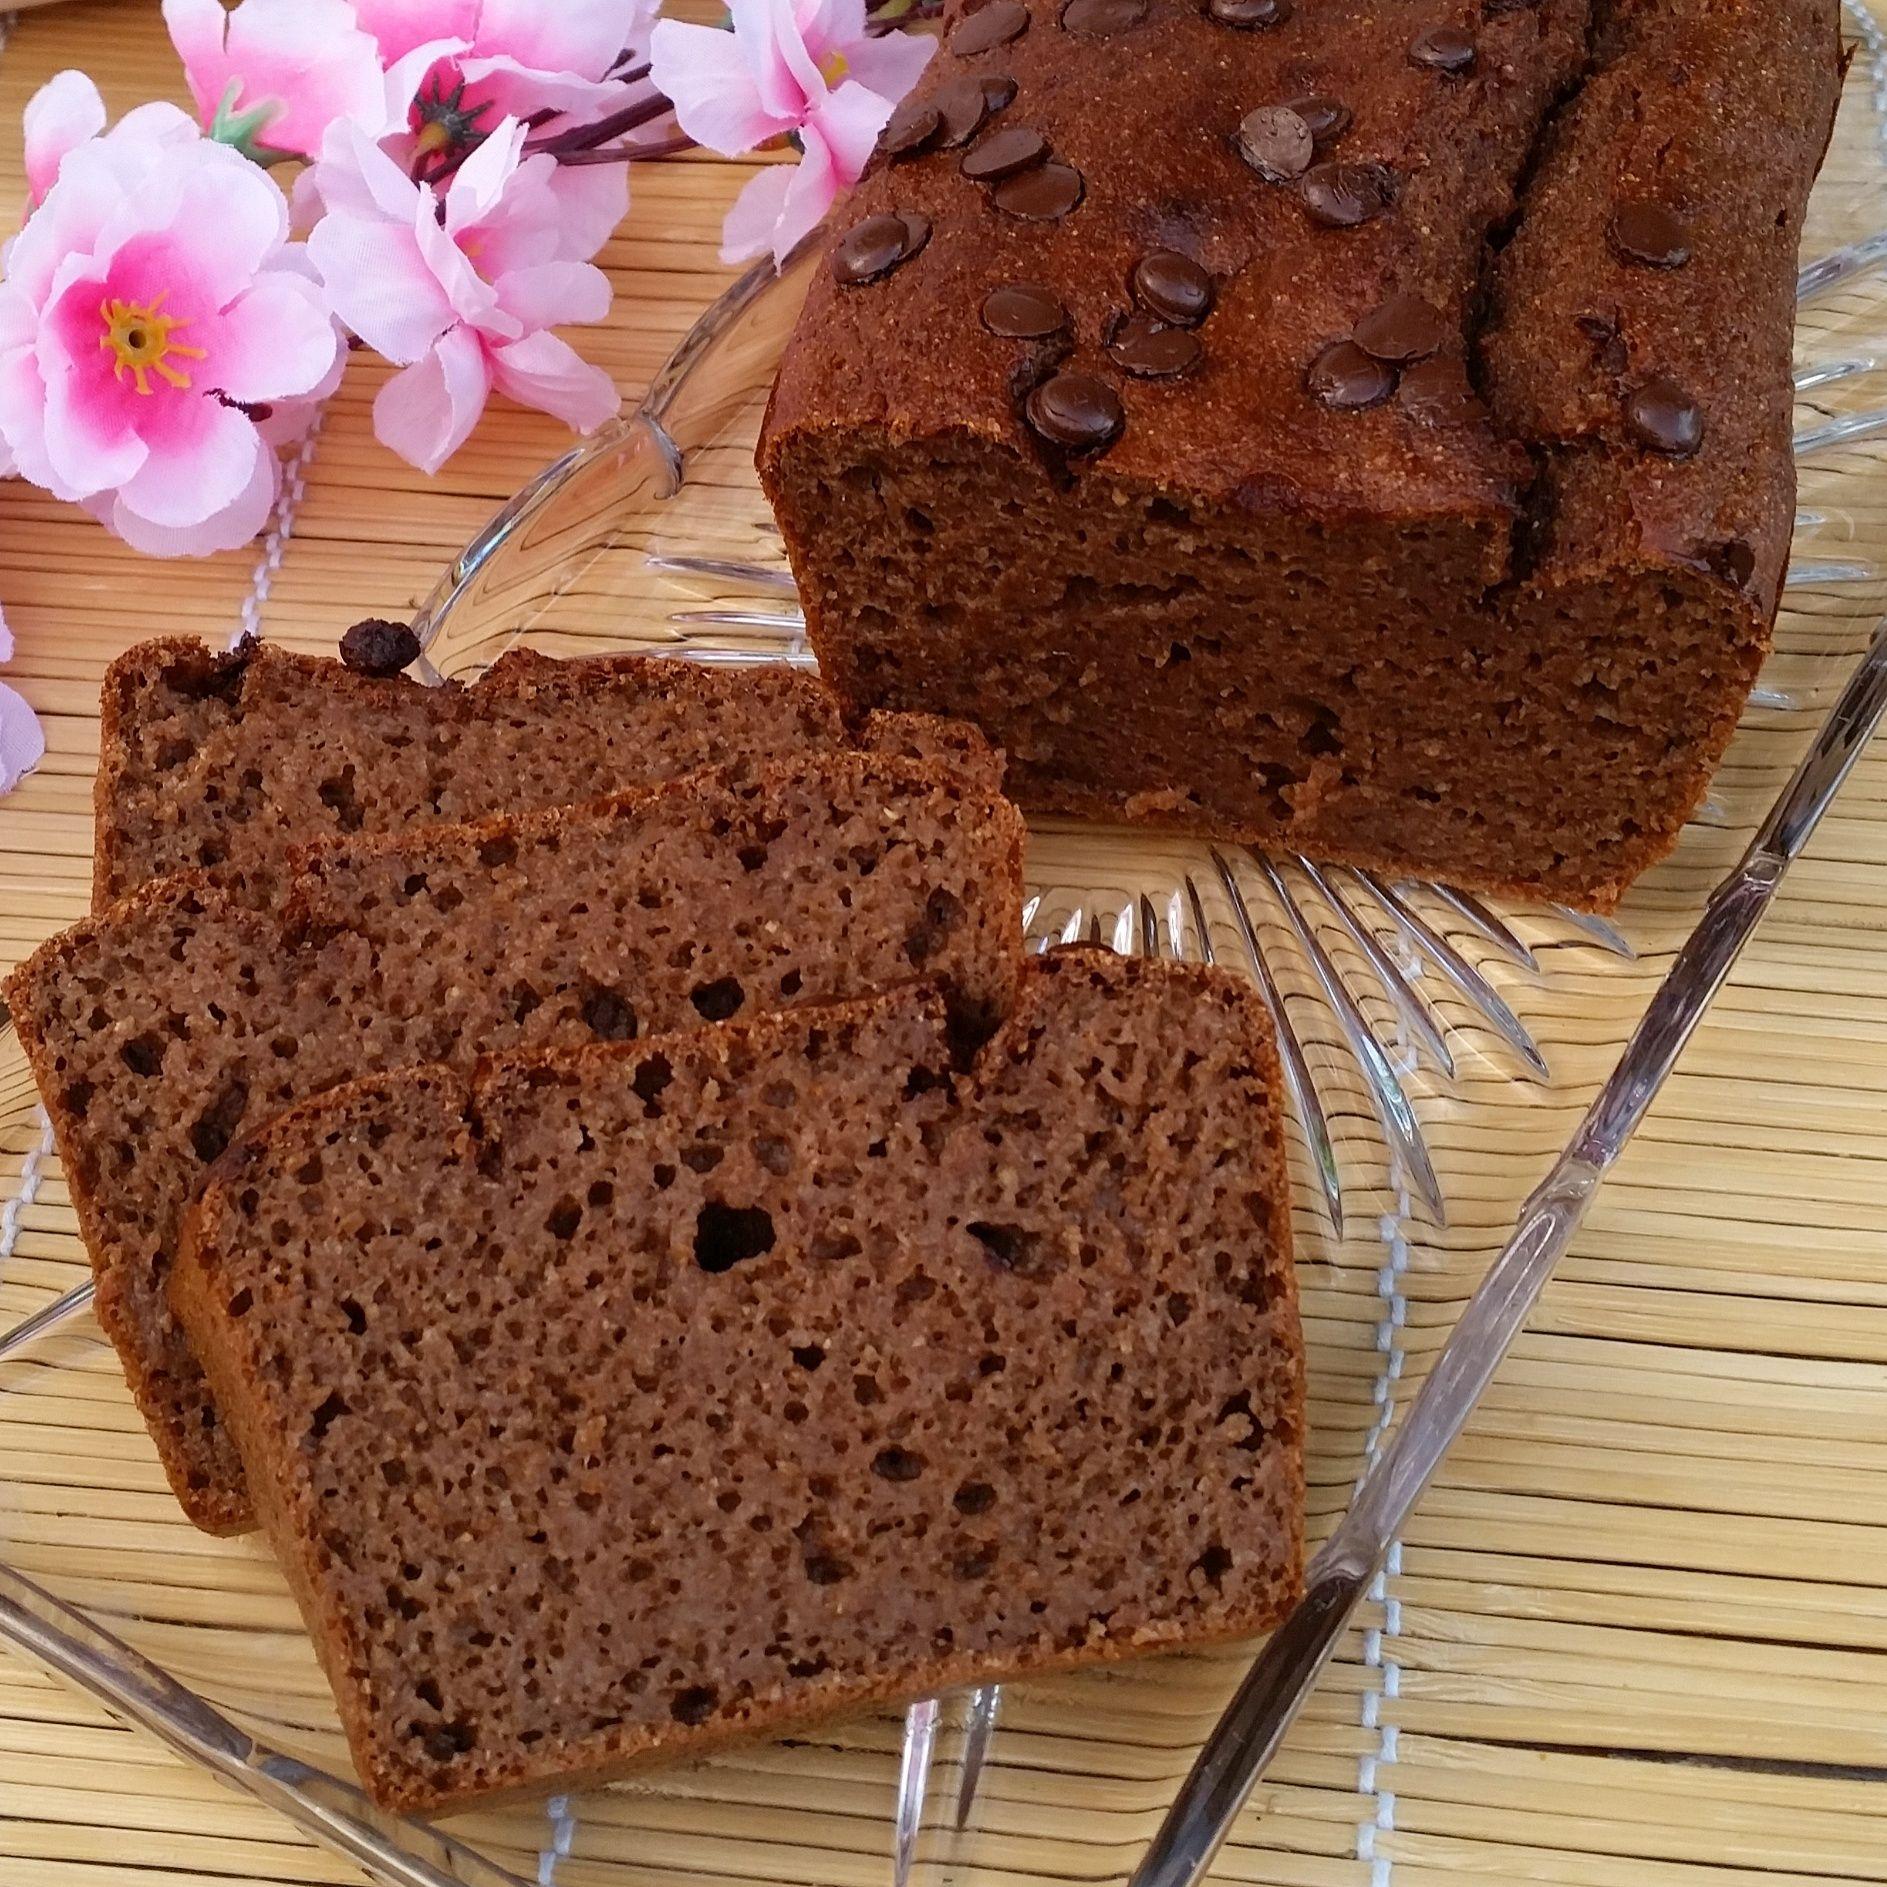 Bananen Schoko Protein Kuchen Kochrezepte Pinterest Bread